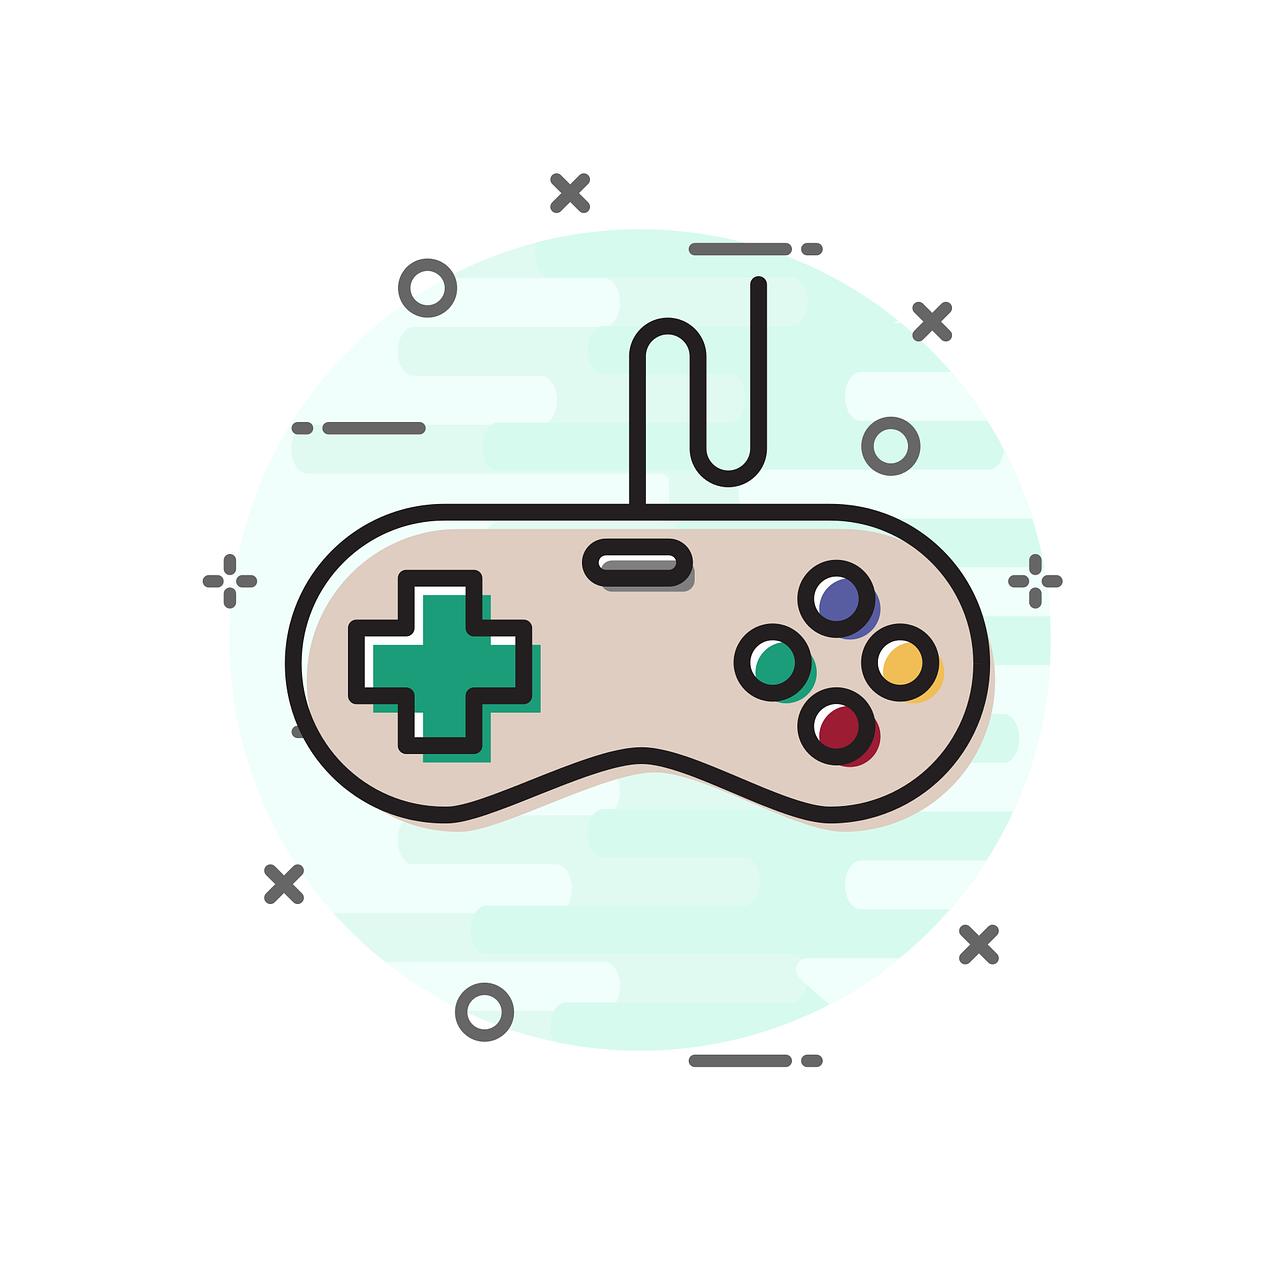 Pythonでジョイスティック(ゲームパッド)を制御する